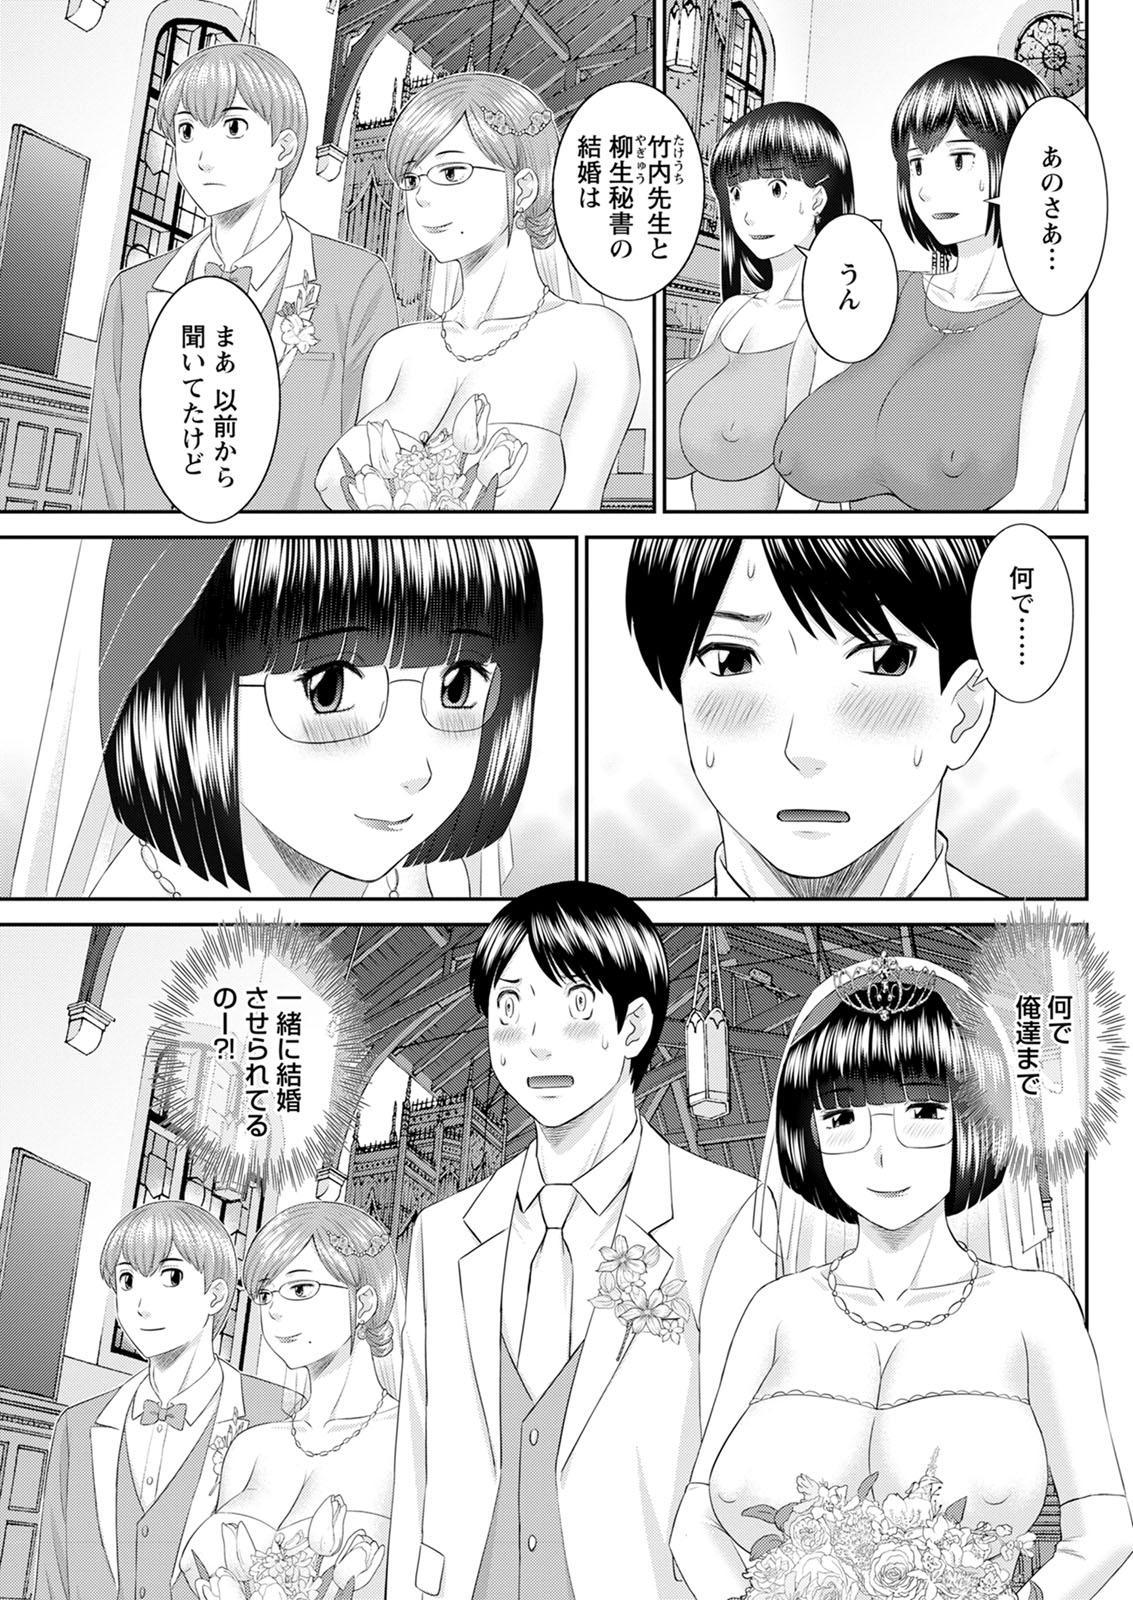 [Kawamori Misaki] Kaikan Hitotsuma Gakuen Ch. 1-6, 8-20 [Digital] 333